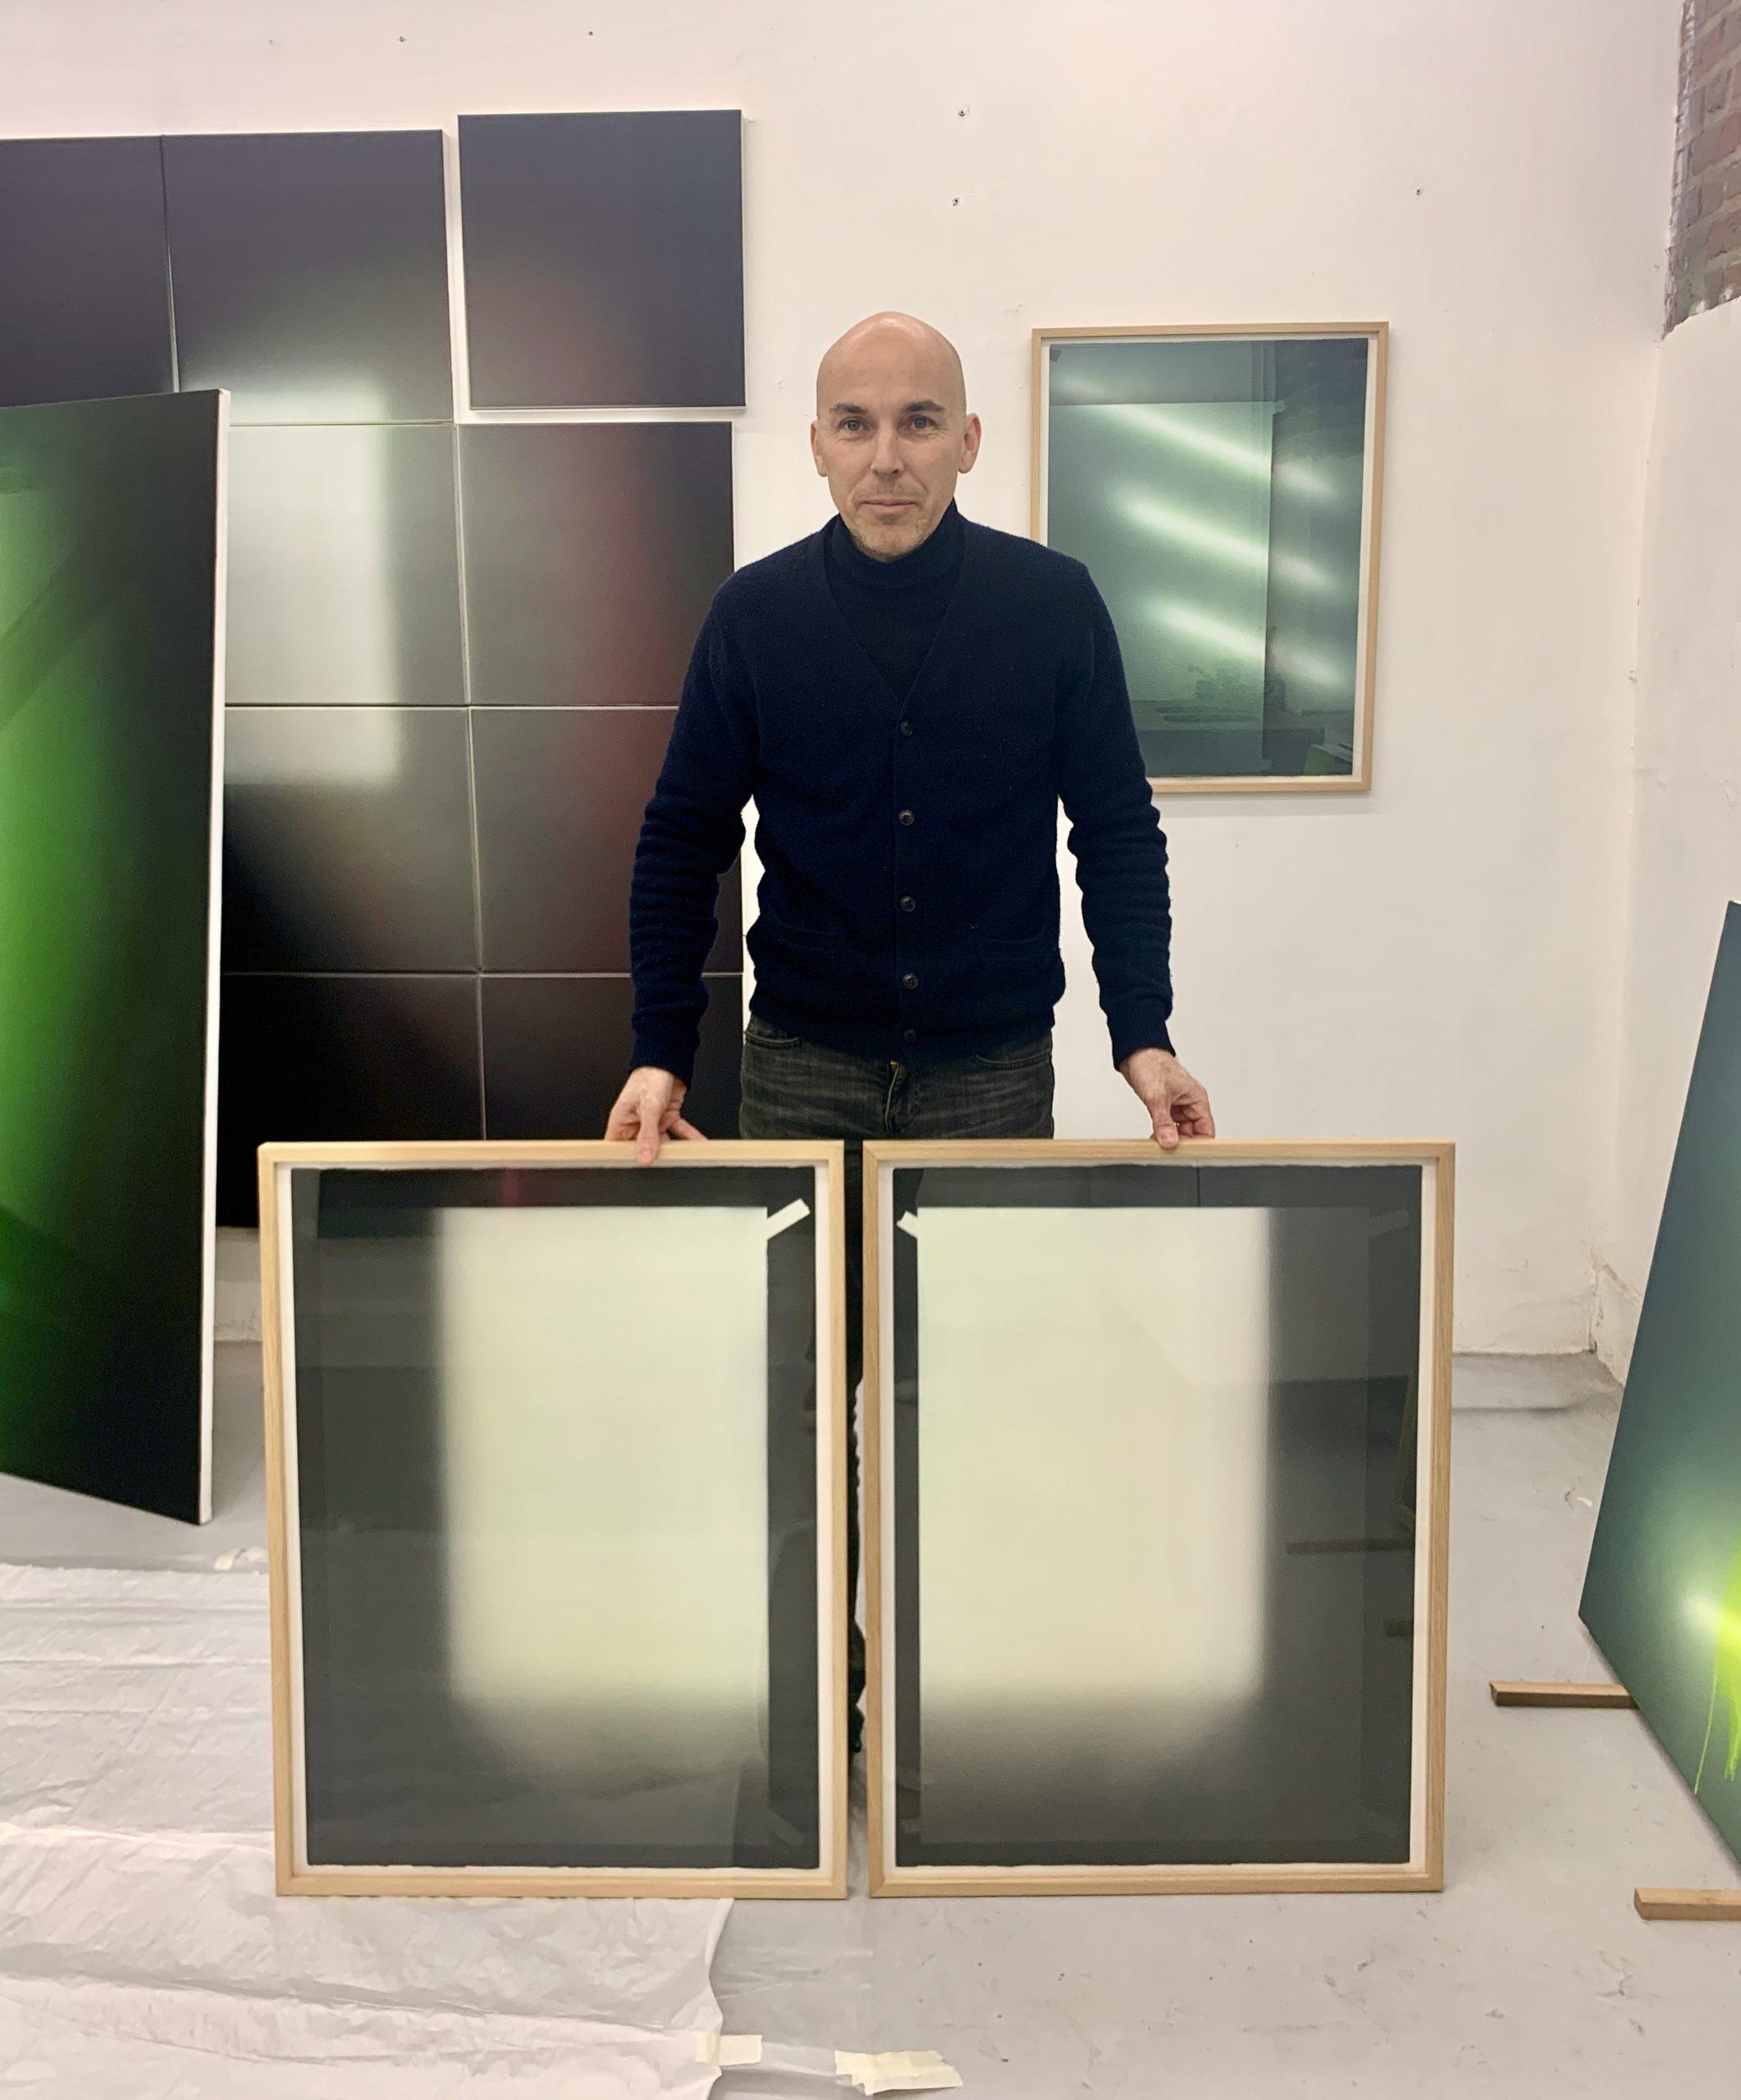 Nicolas Delprat, portait, courtesy artvisions2020